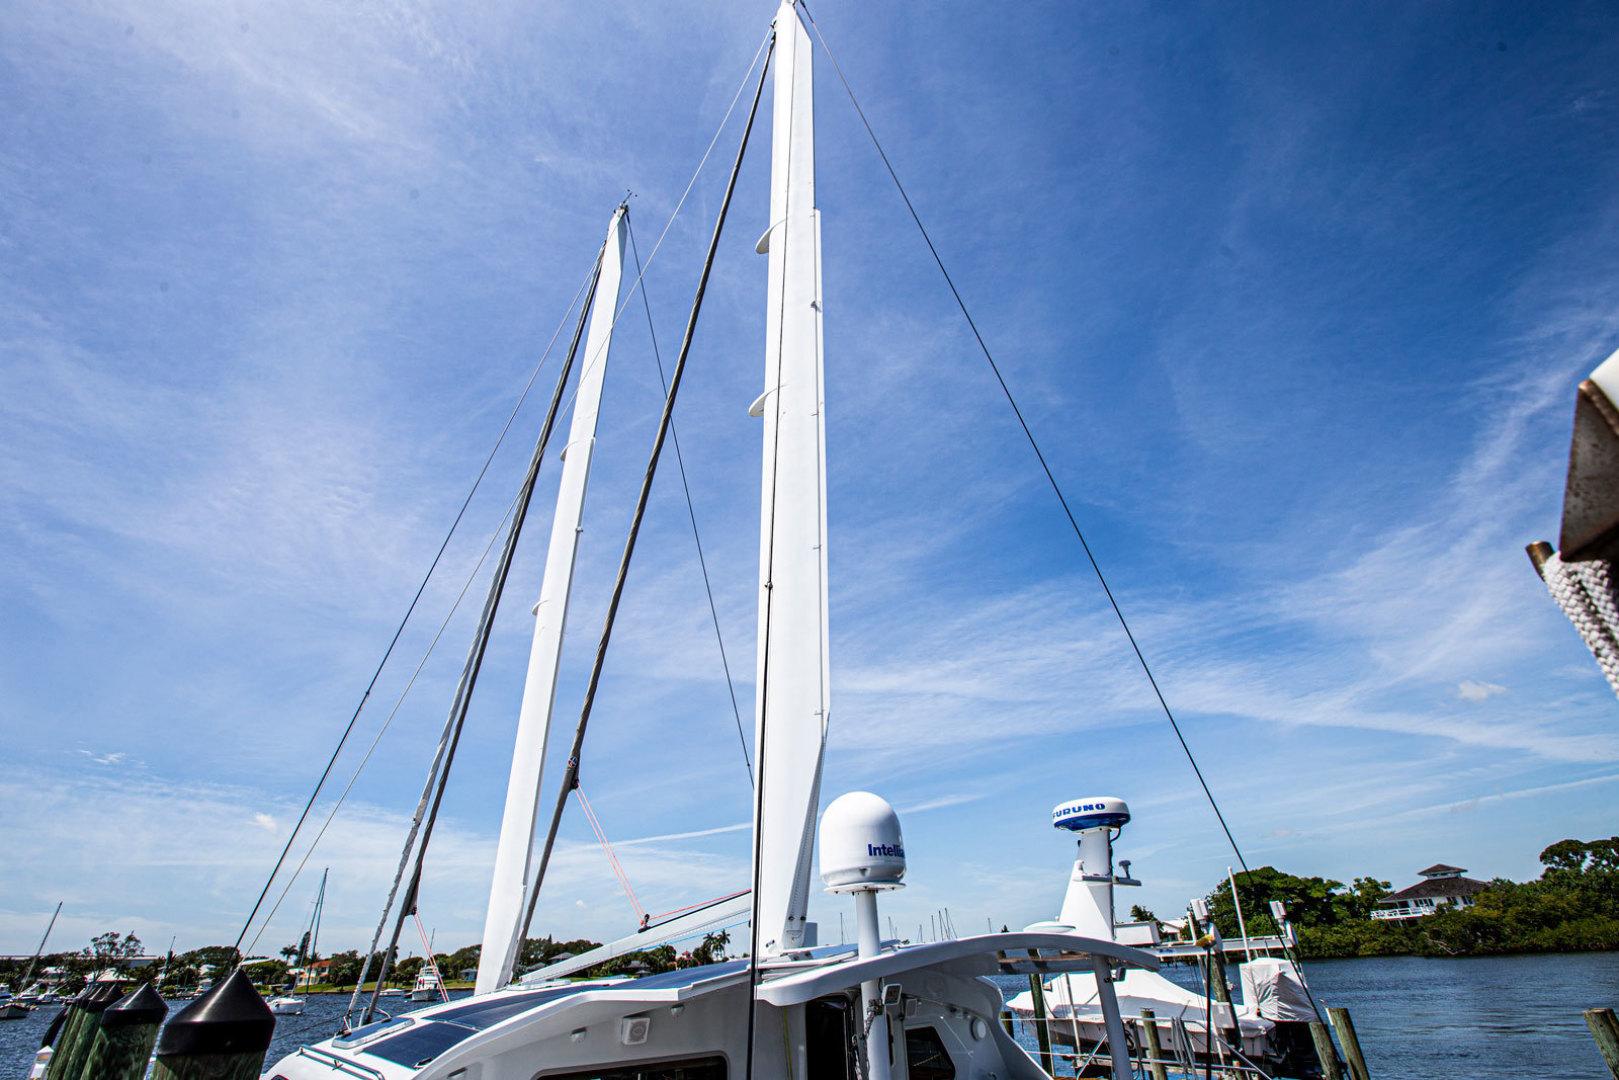 Atlantic-49 Catamaran 2018-Wabi Sabi Stuart-Florida-United States-1399252 | Thumbnail